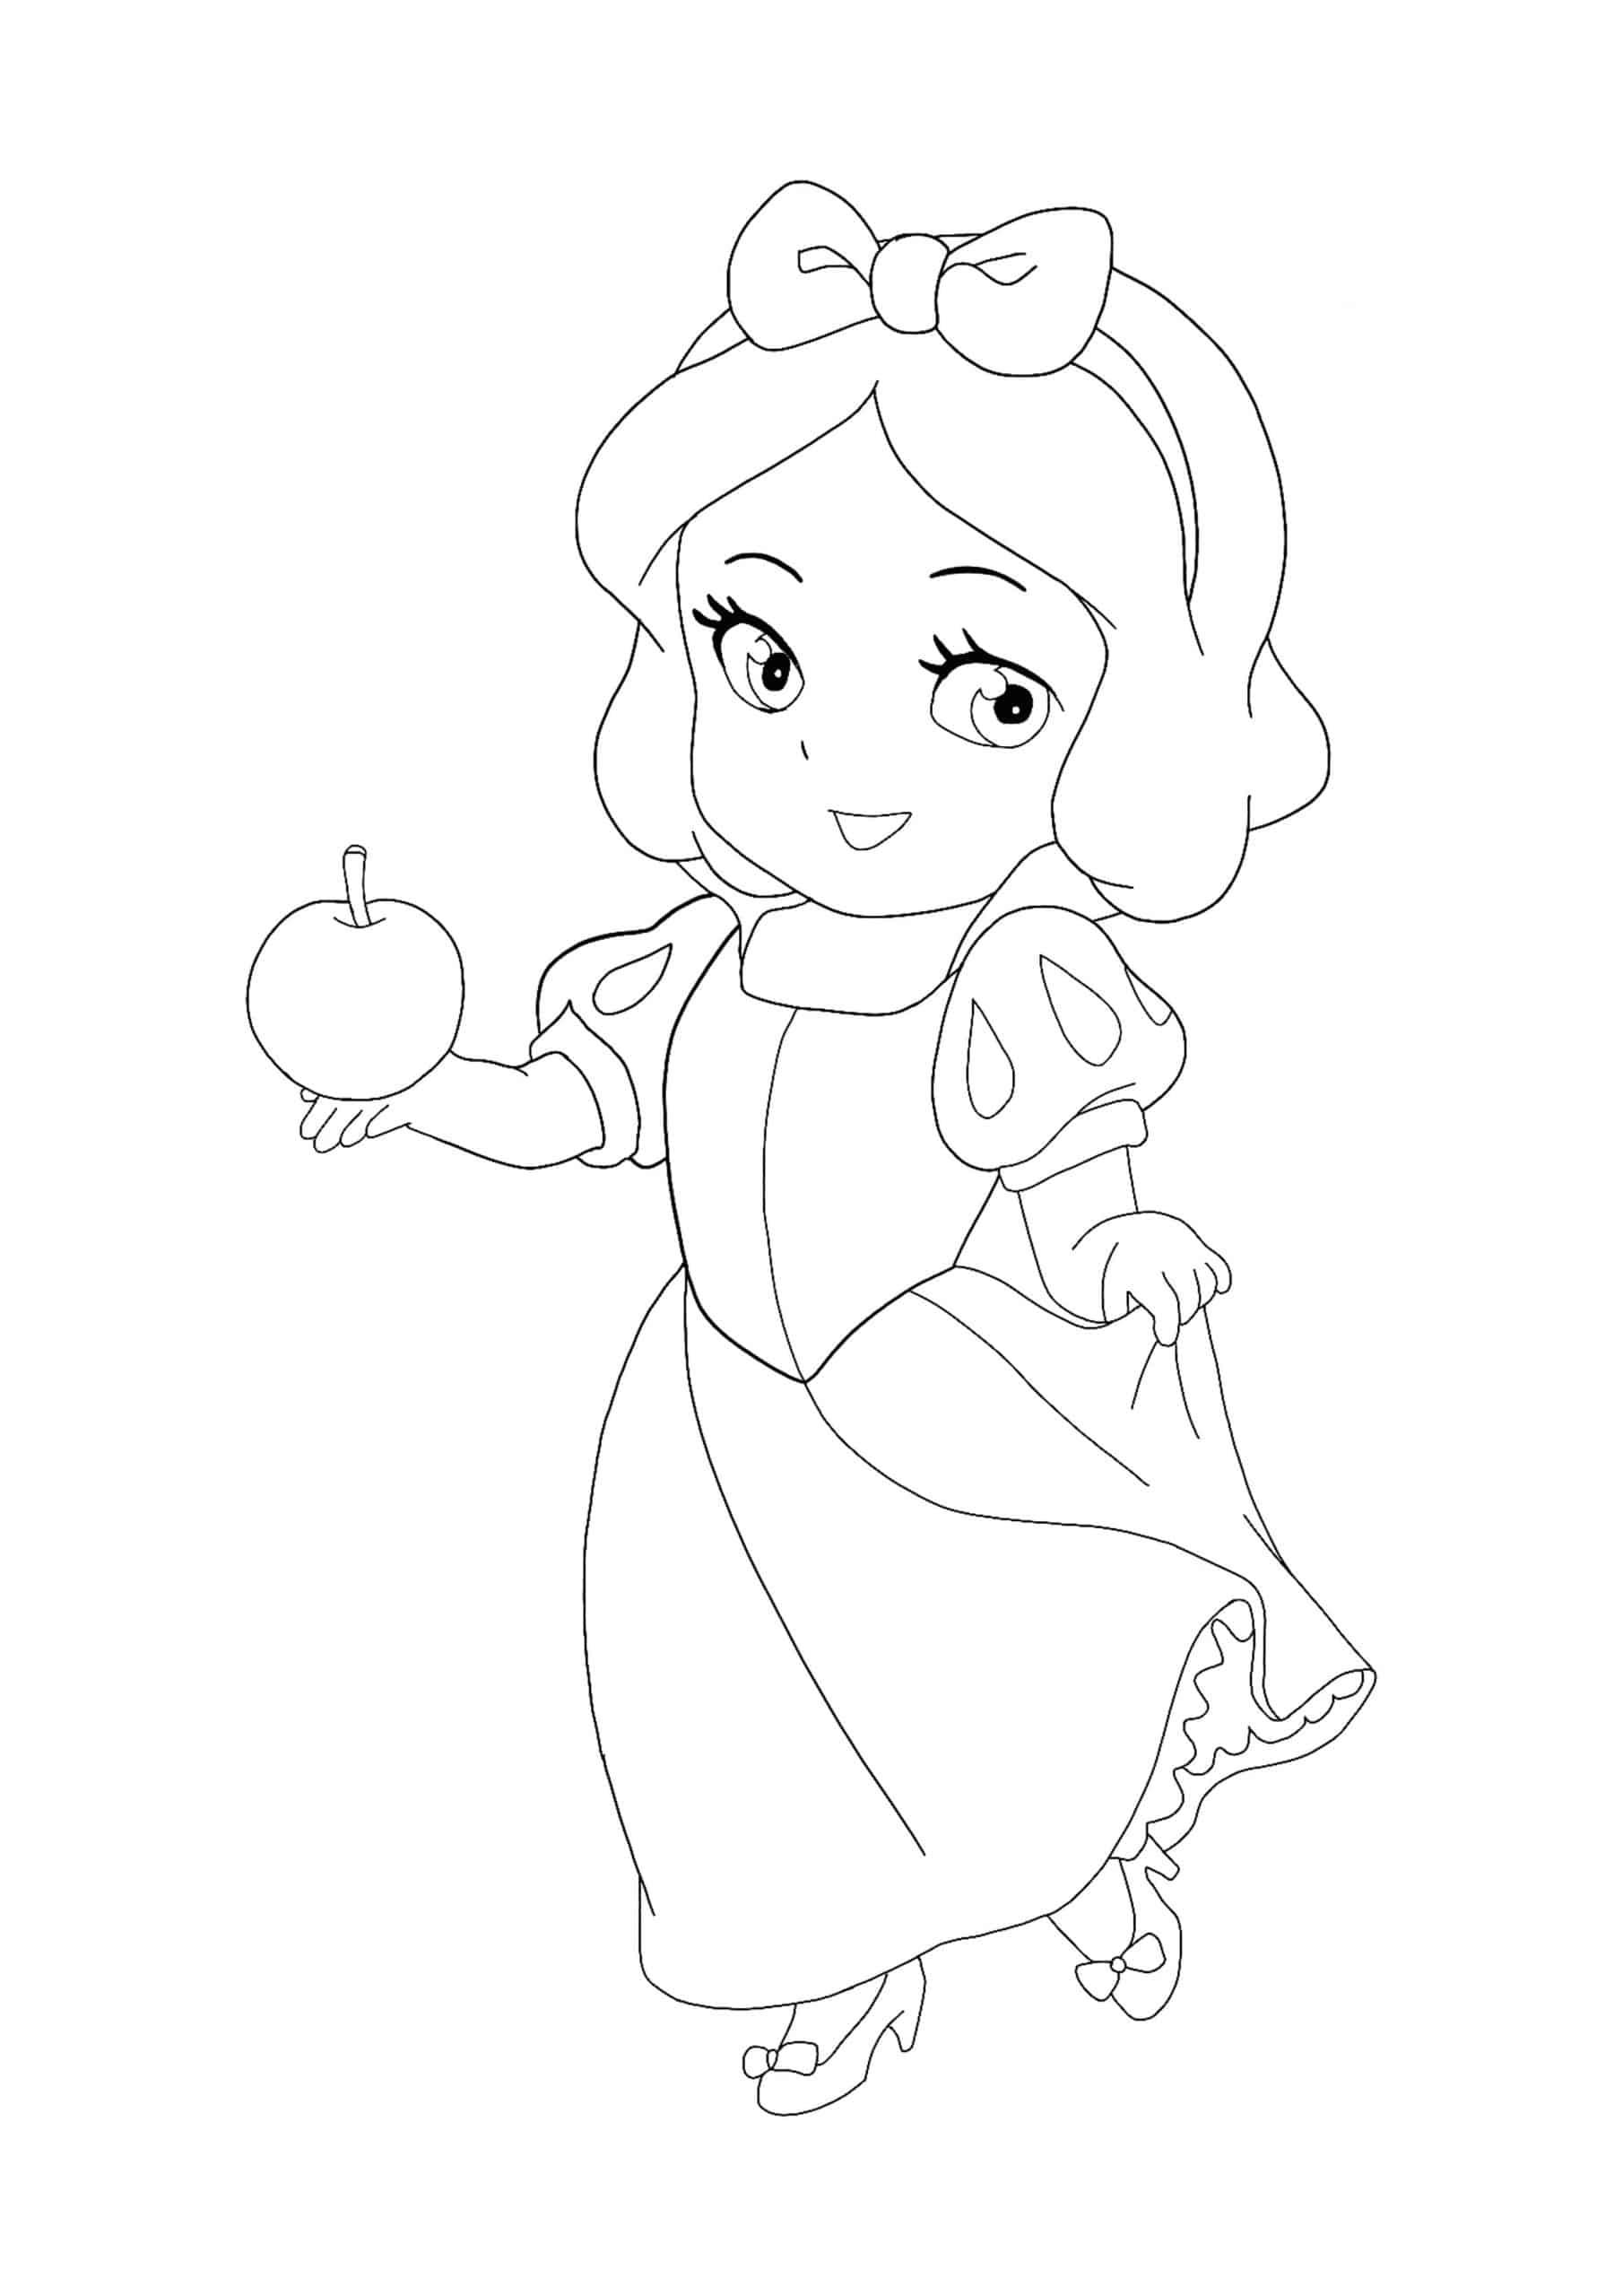 Coloriage Kawaii Disney Princesse Blanche Neige